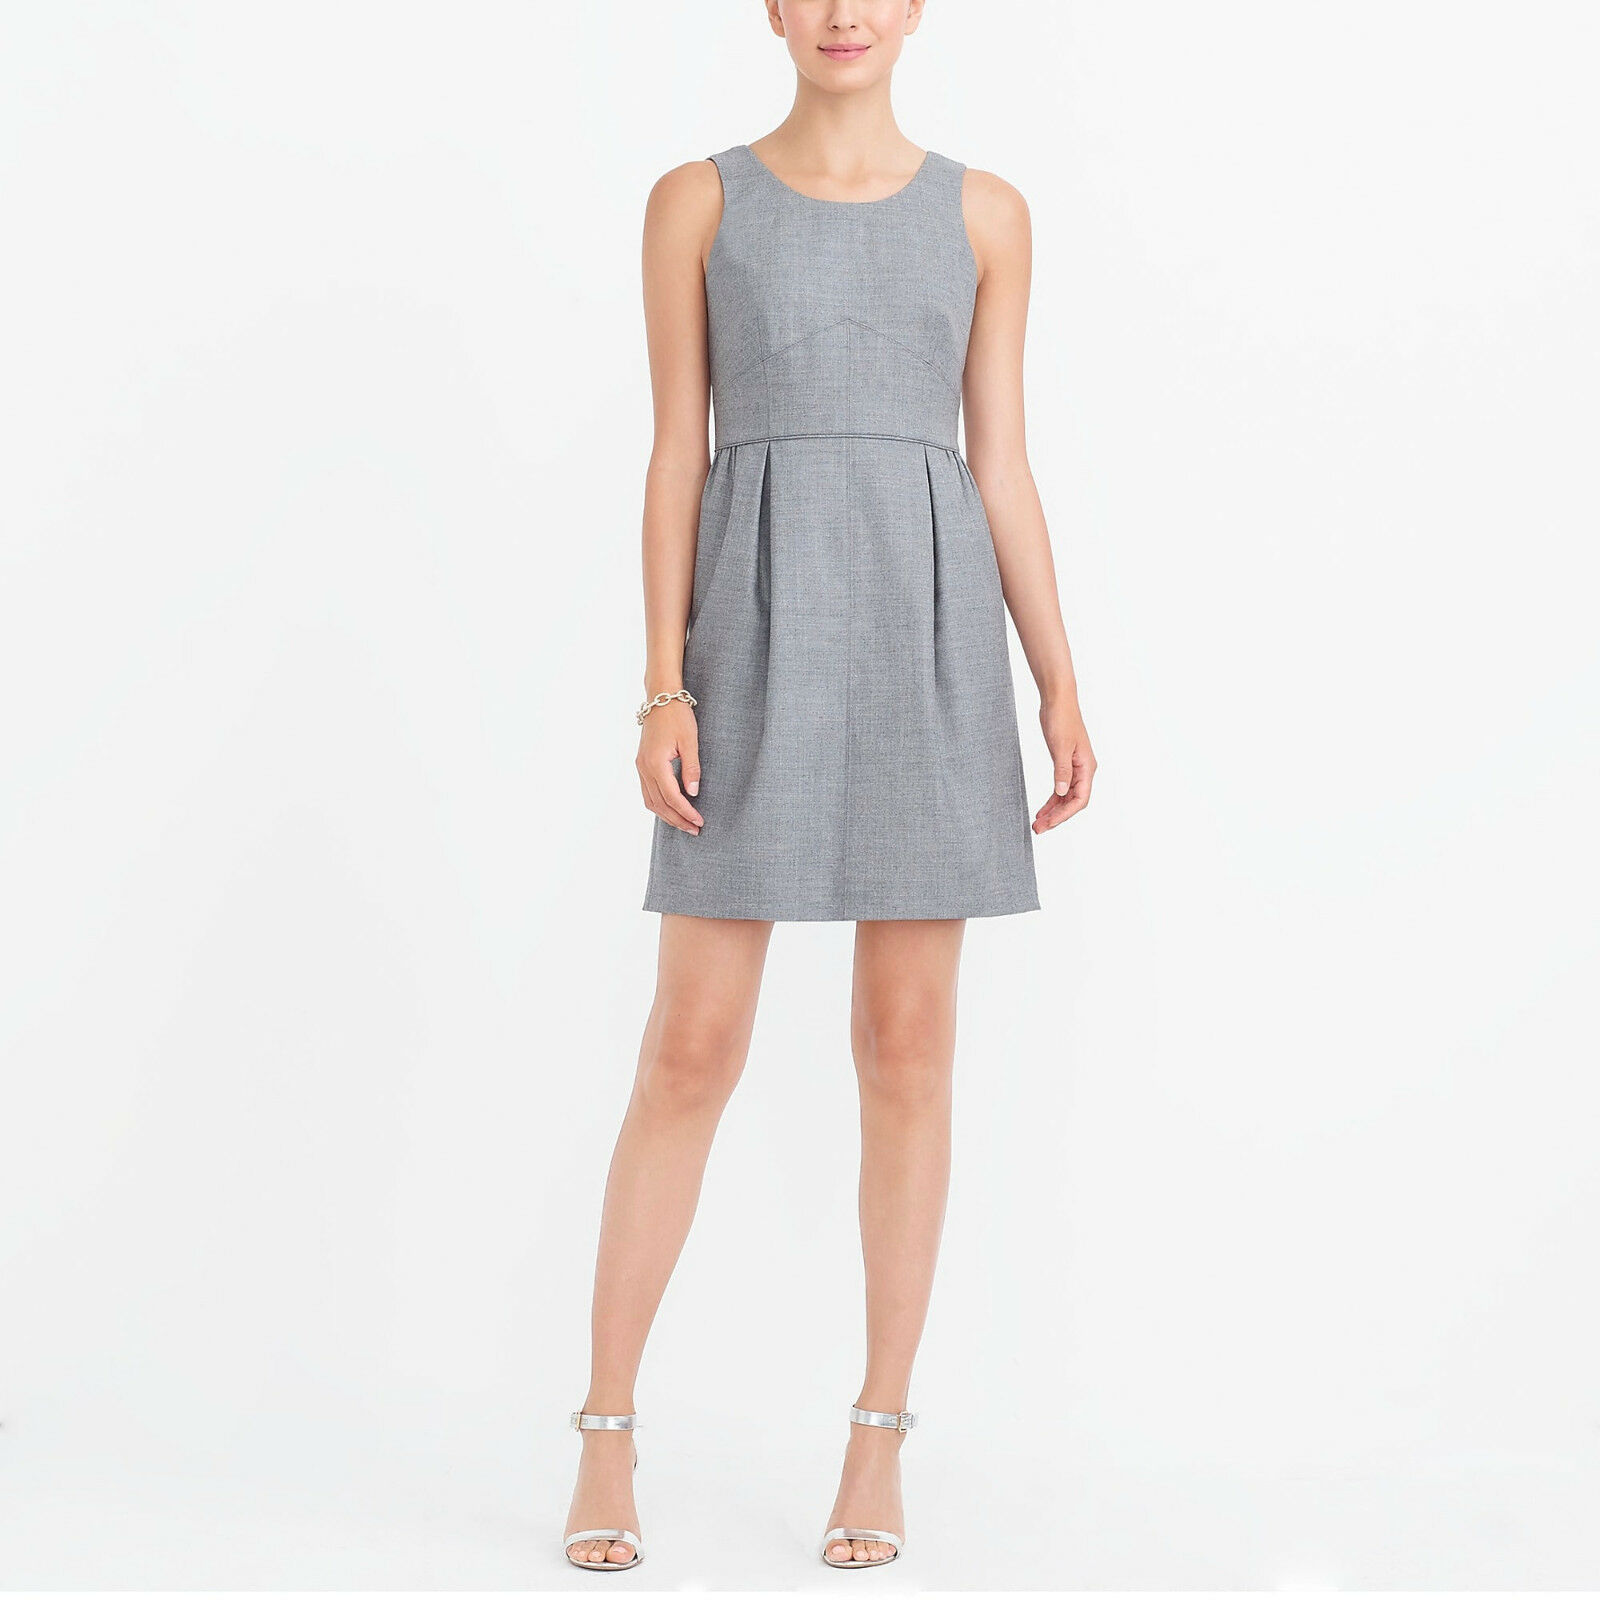 J Crew Pleated Shift Dress Sleeveless Wool Flannel 02667 Heather Pewter 4